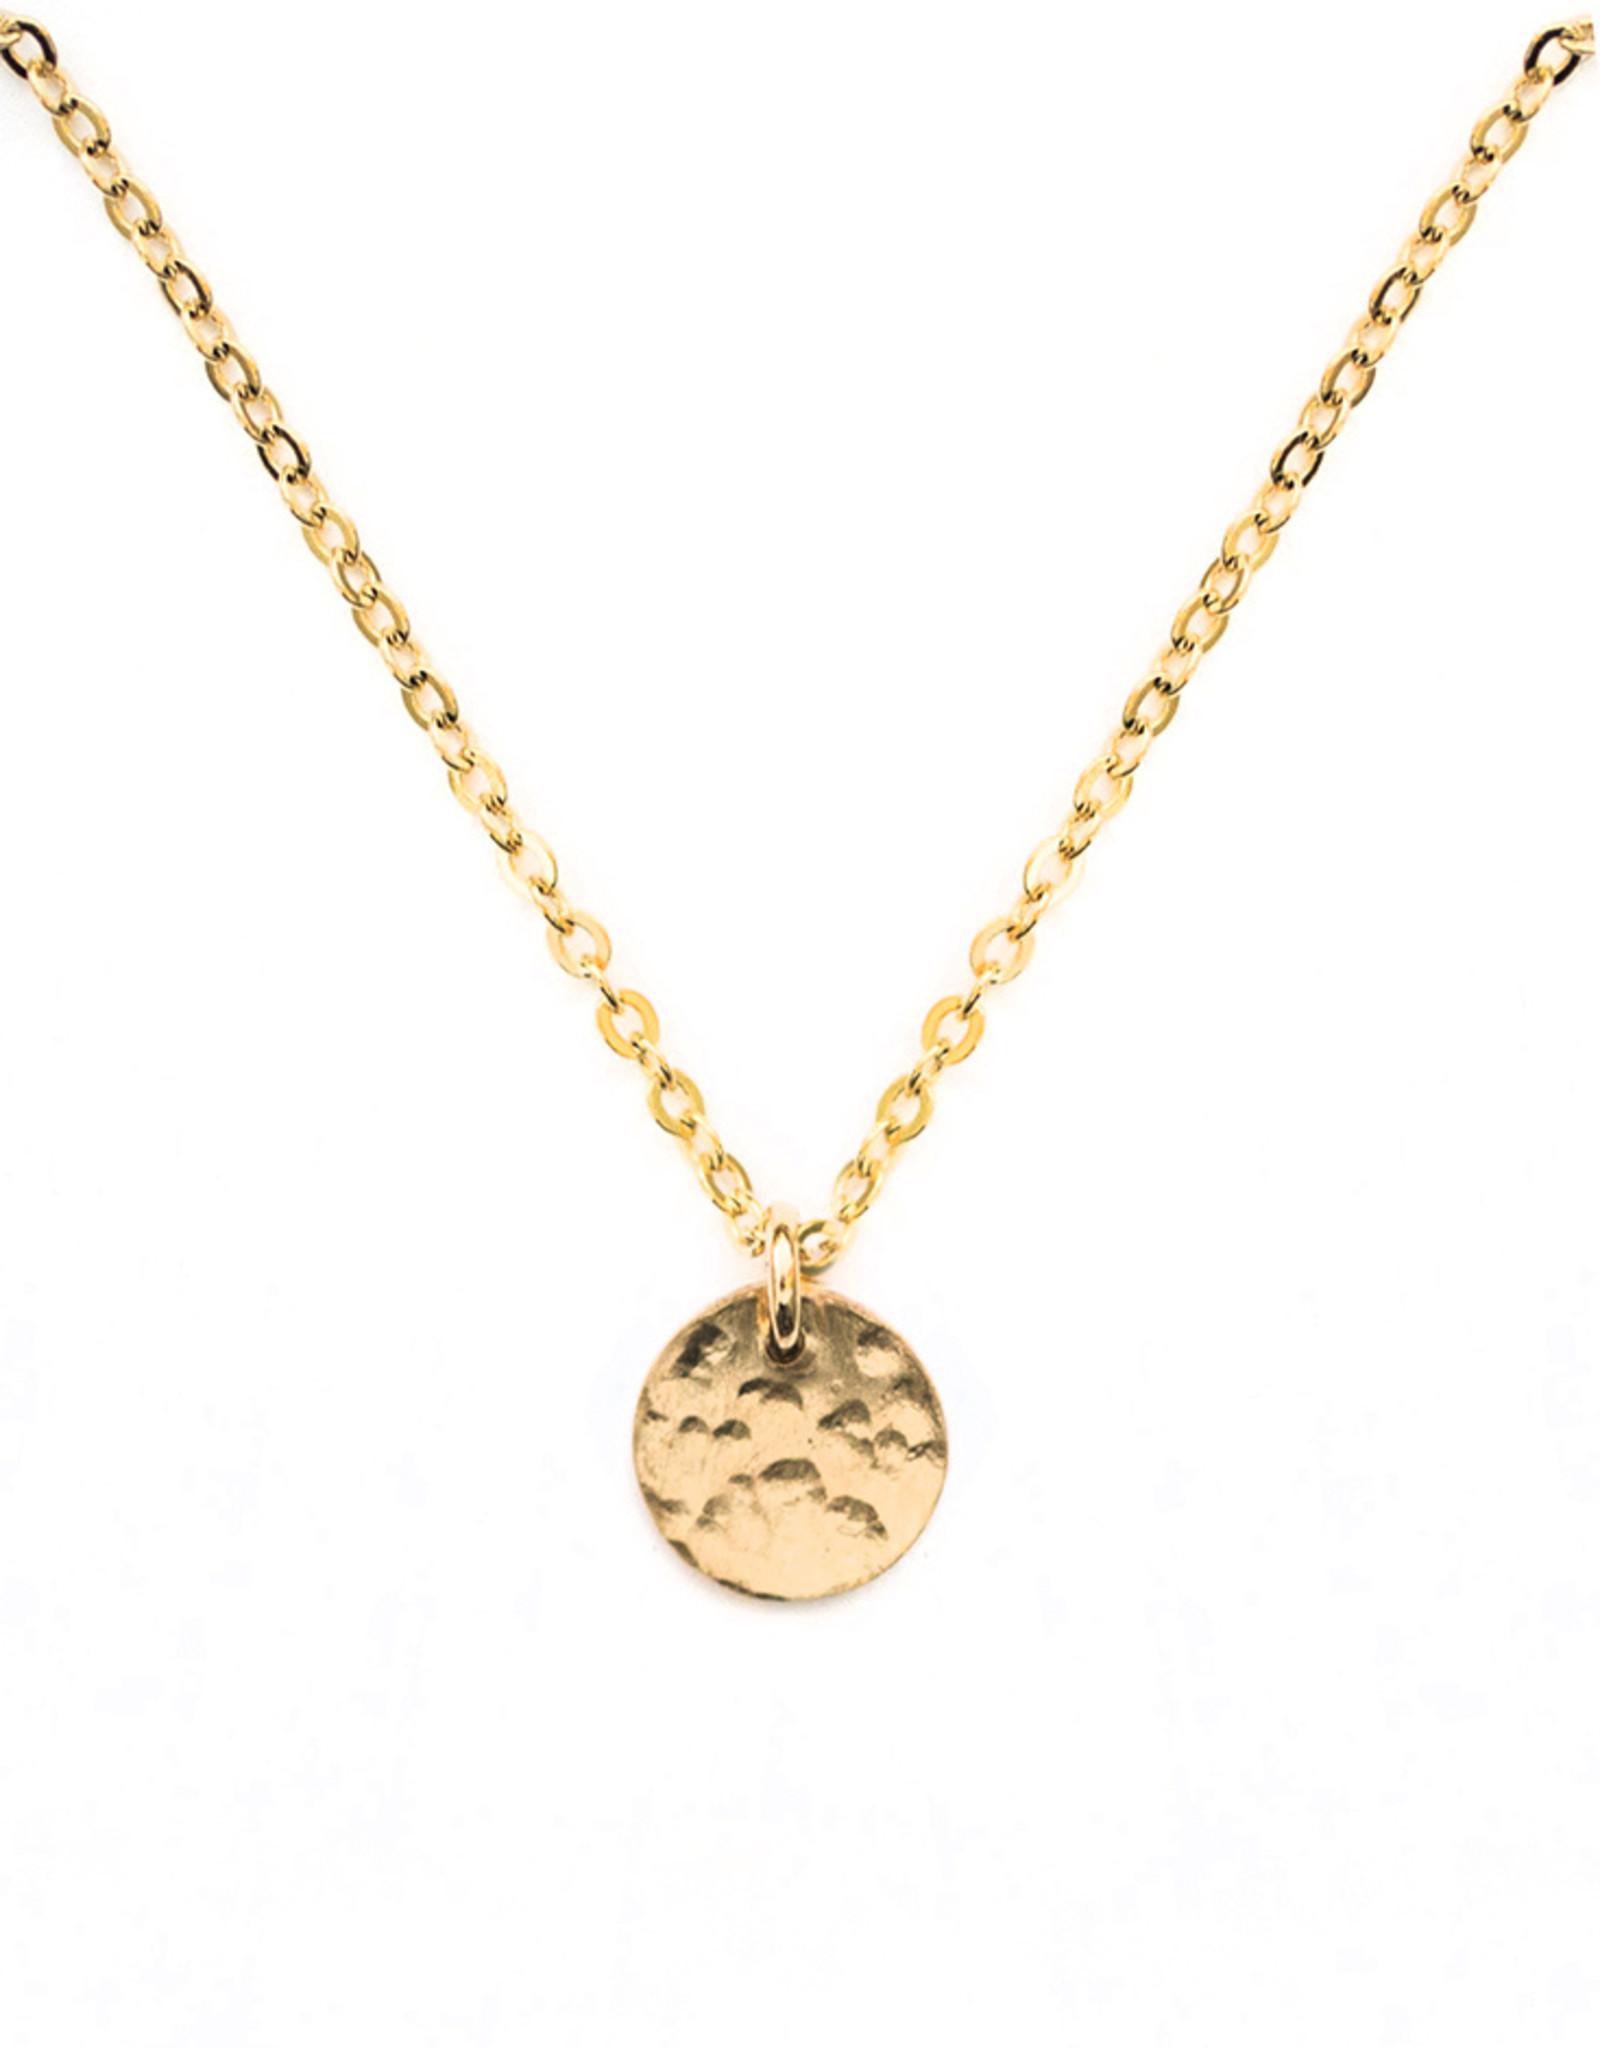 sara forrest design Textured Circle Charm Necklace